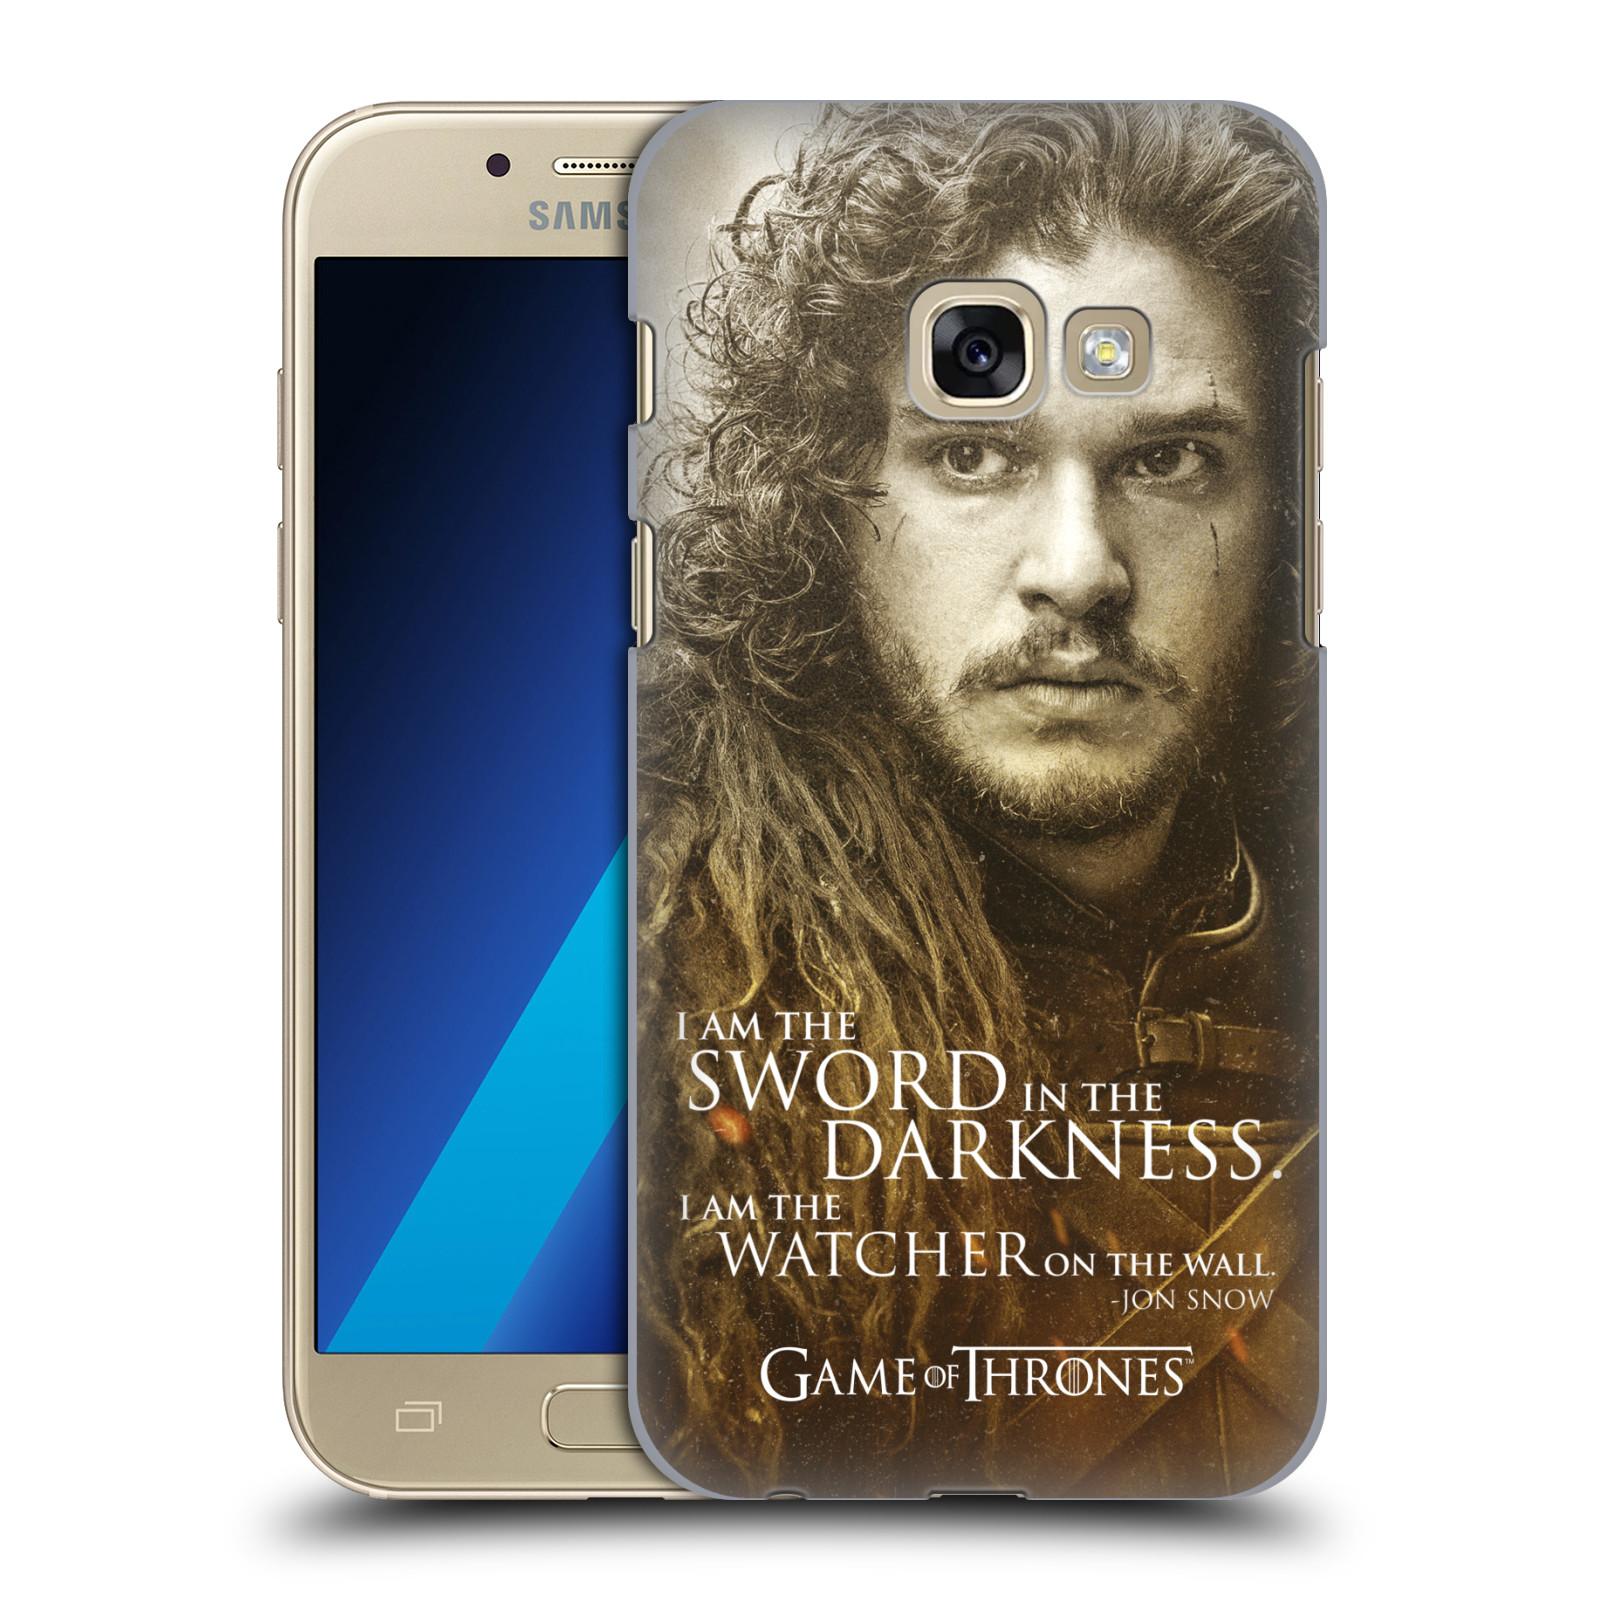 Plastové pouzdro na mobil Samsung Galaxy A3 (2017) HEAD CASE Hra o trůny - Jon Snow (Plastový kryt či obal na mobilní telefon s licencovaným motivem Hra o trůny - Game Of Thrones pro Samsung Galaxy A3 2017 SM-A320)